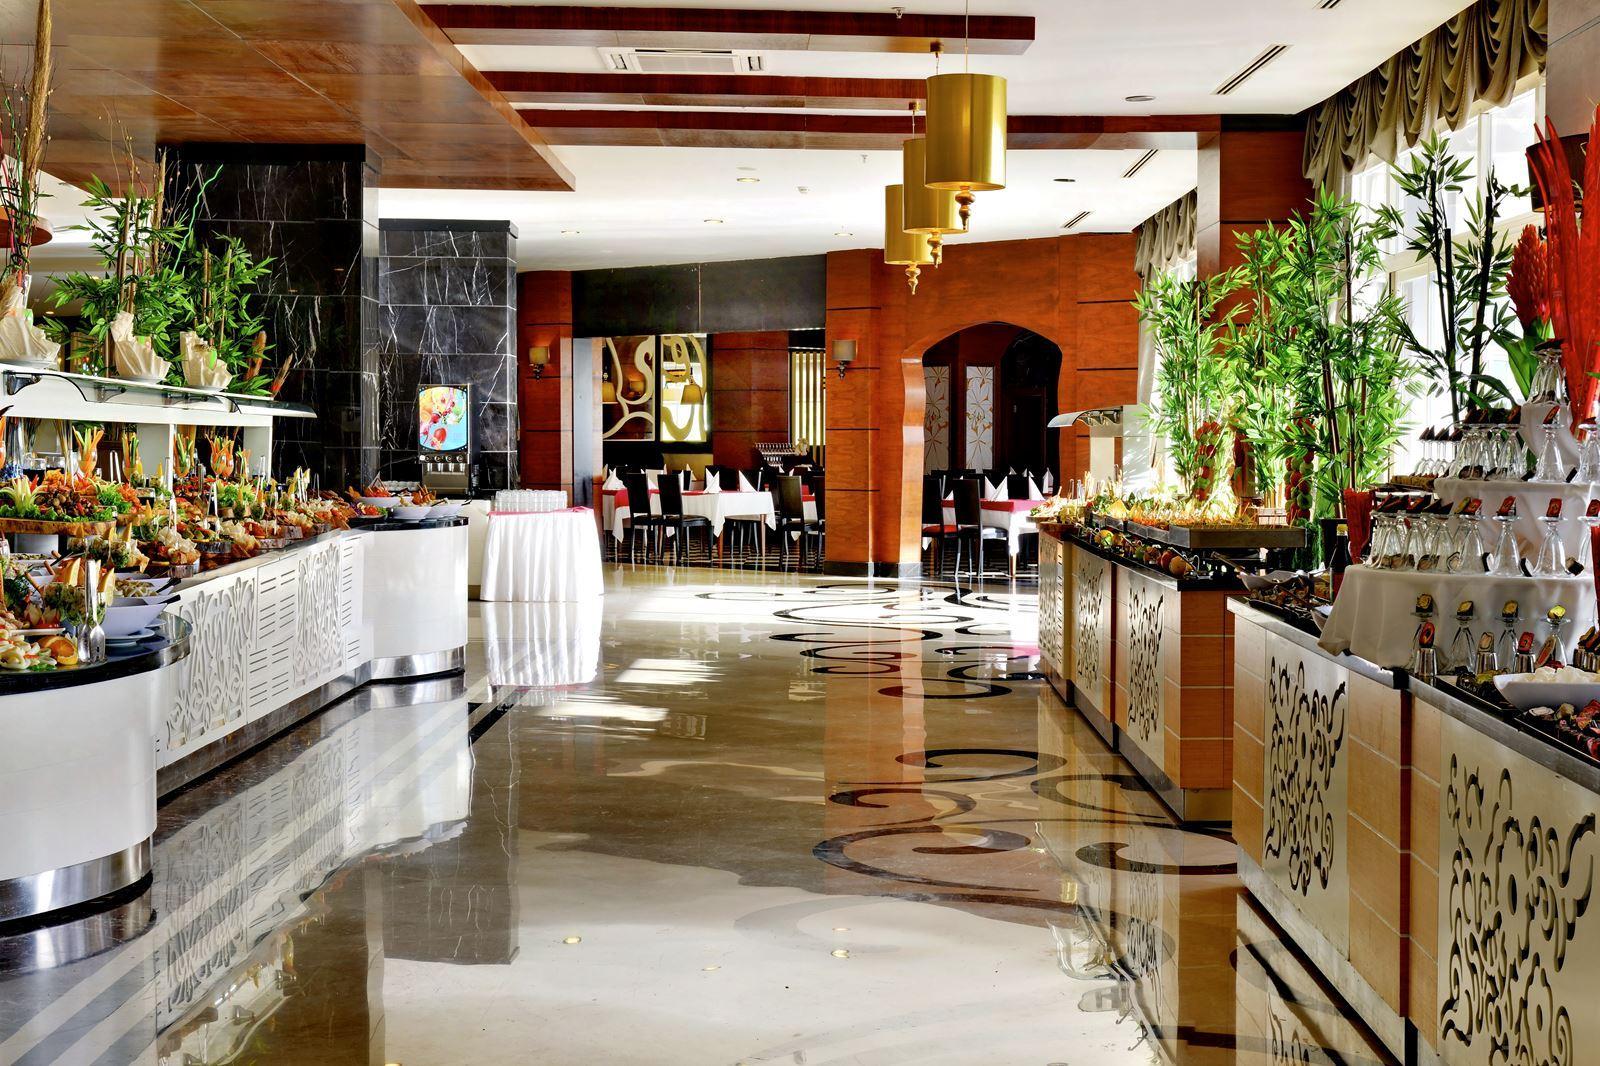 هتل سی پلنت ریزورت و اسپا آنتالیا